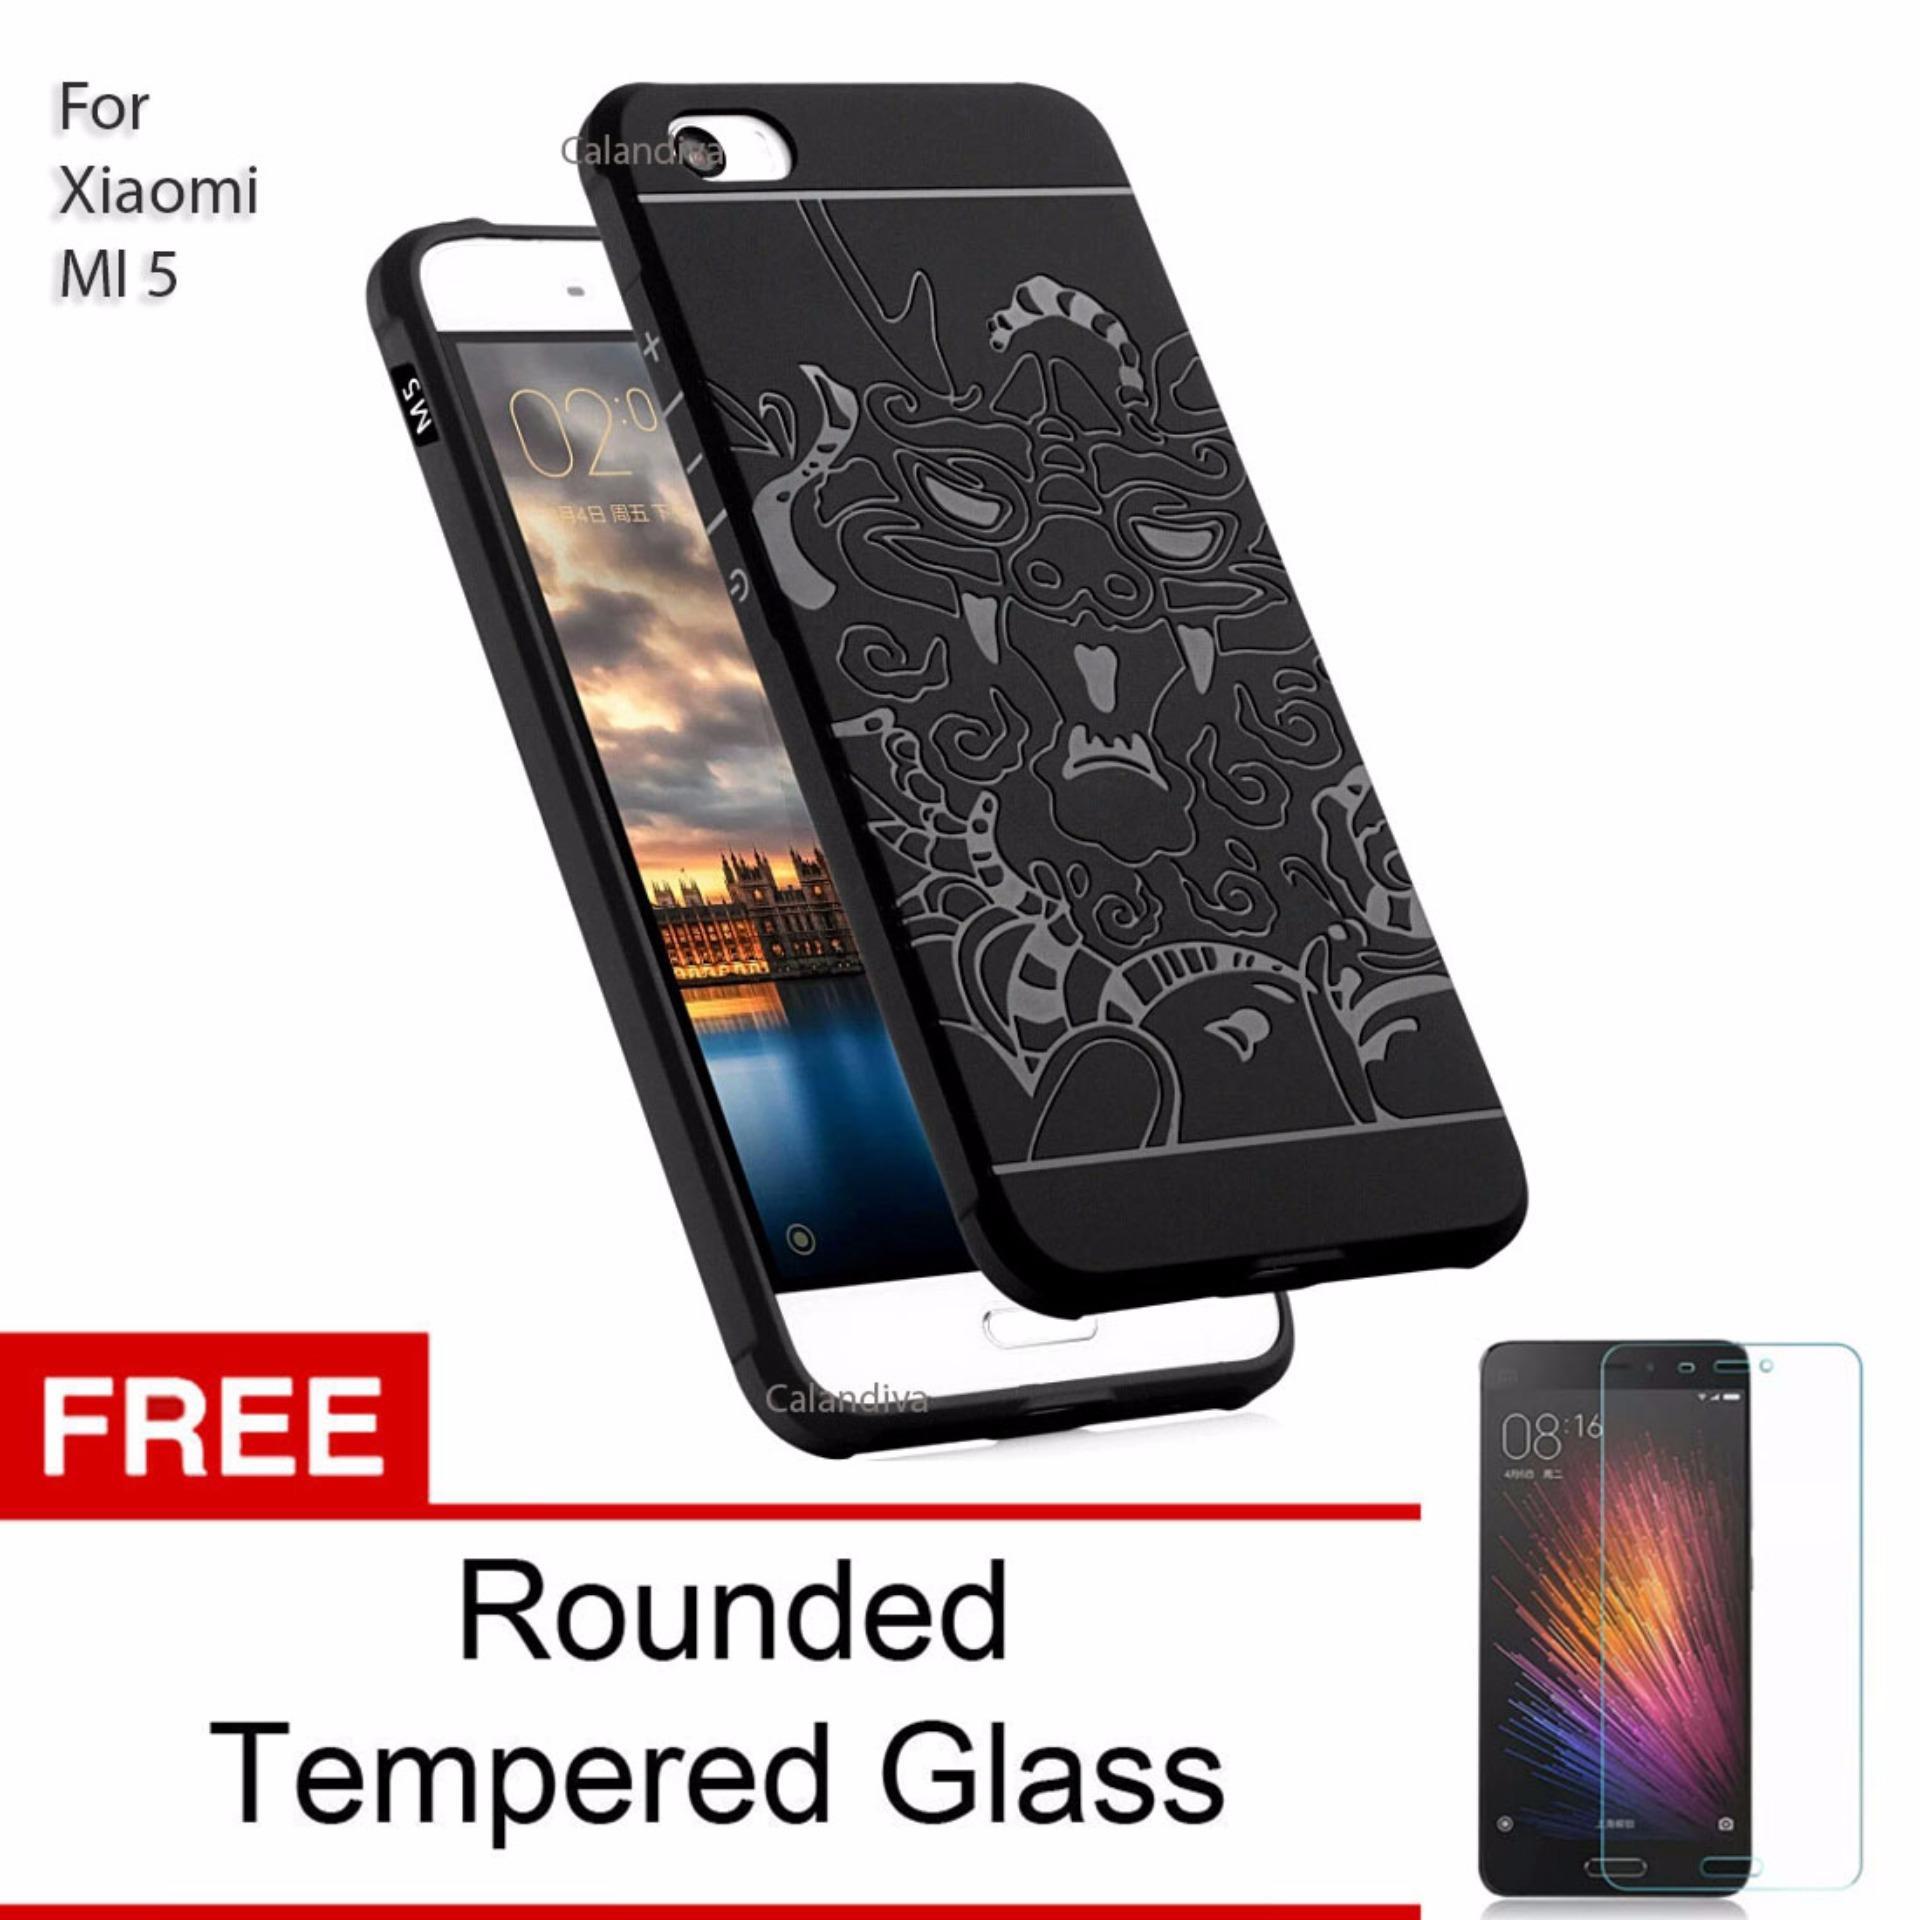 Case For Xiaomi Redmi 4 Prime Pro Dragon Shockproof Hybrid Calandiva Luxury Tempered Glass Premium Note 5 Hitam Daftar Source Untuk Mi